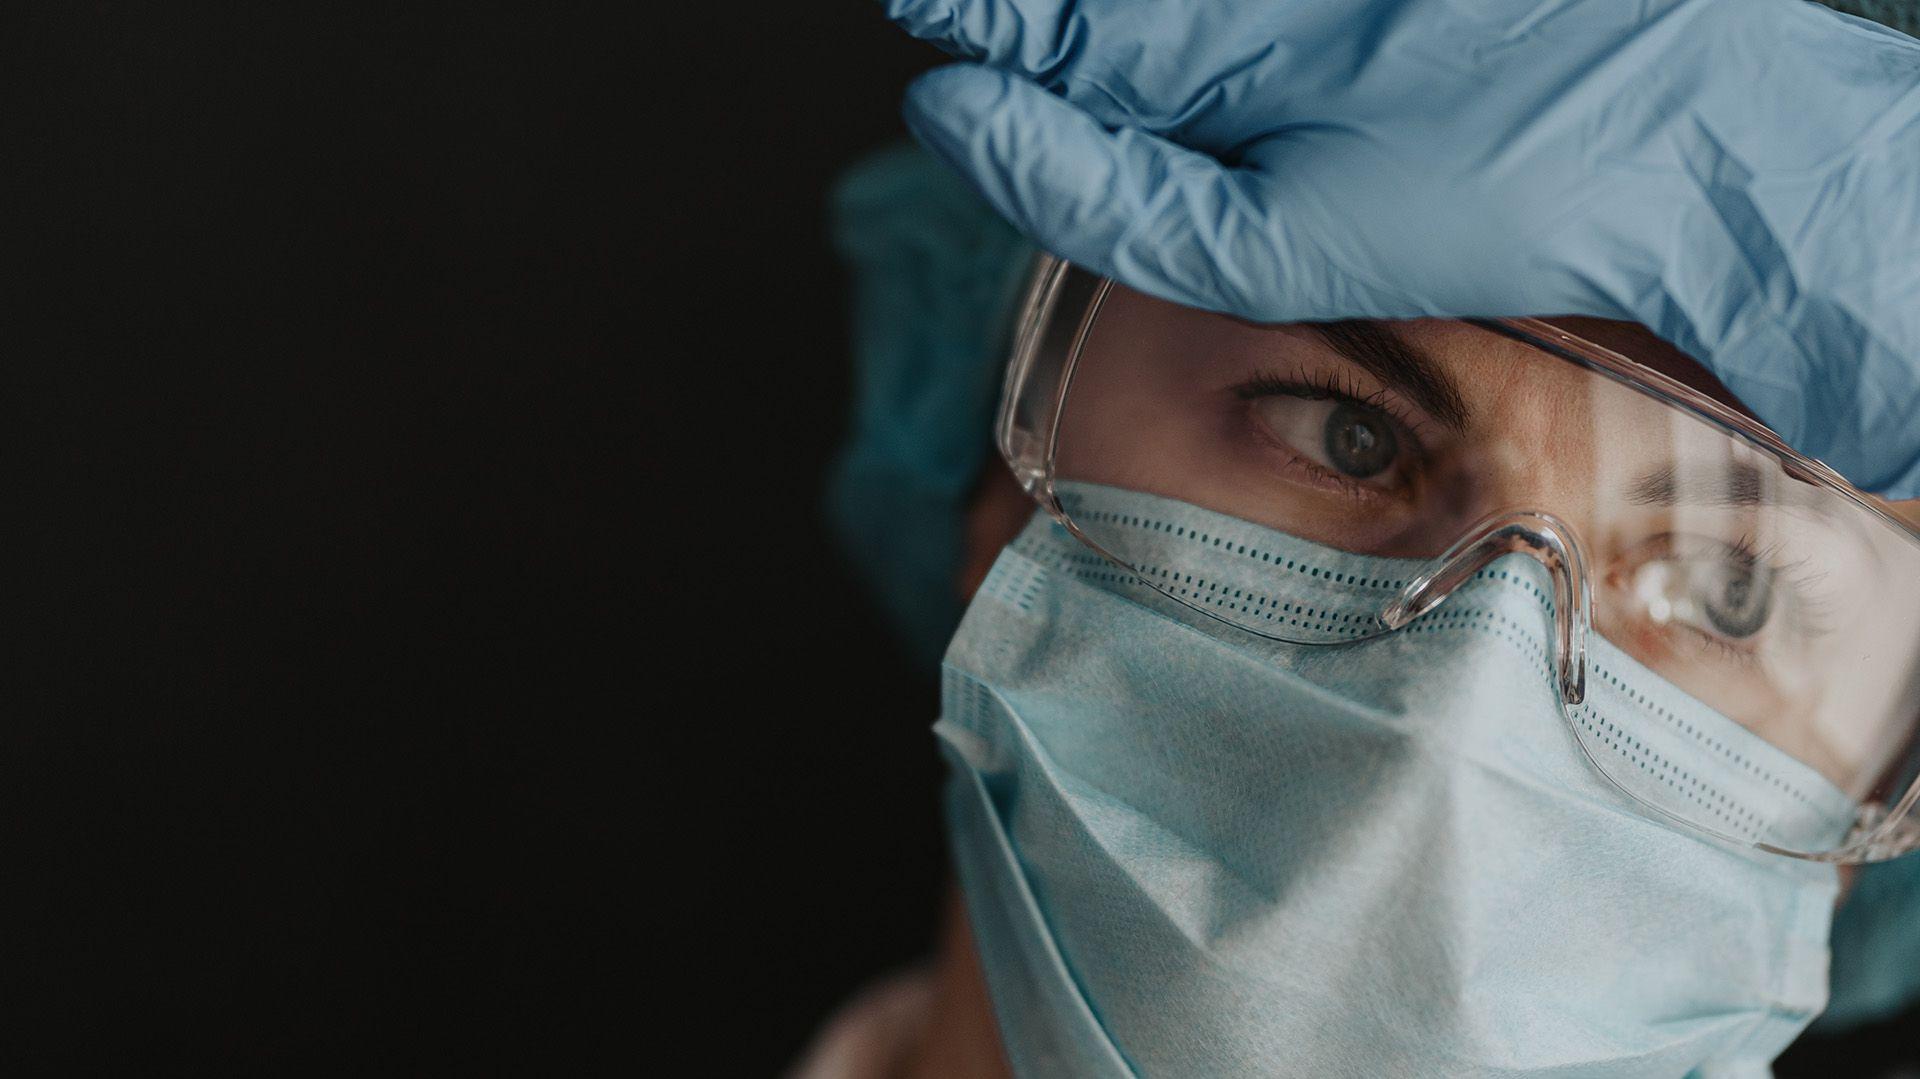 Médicos estrés coronavirus 1920x1080